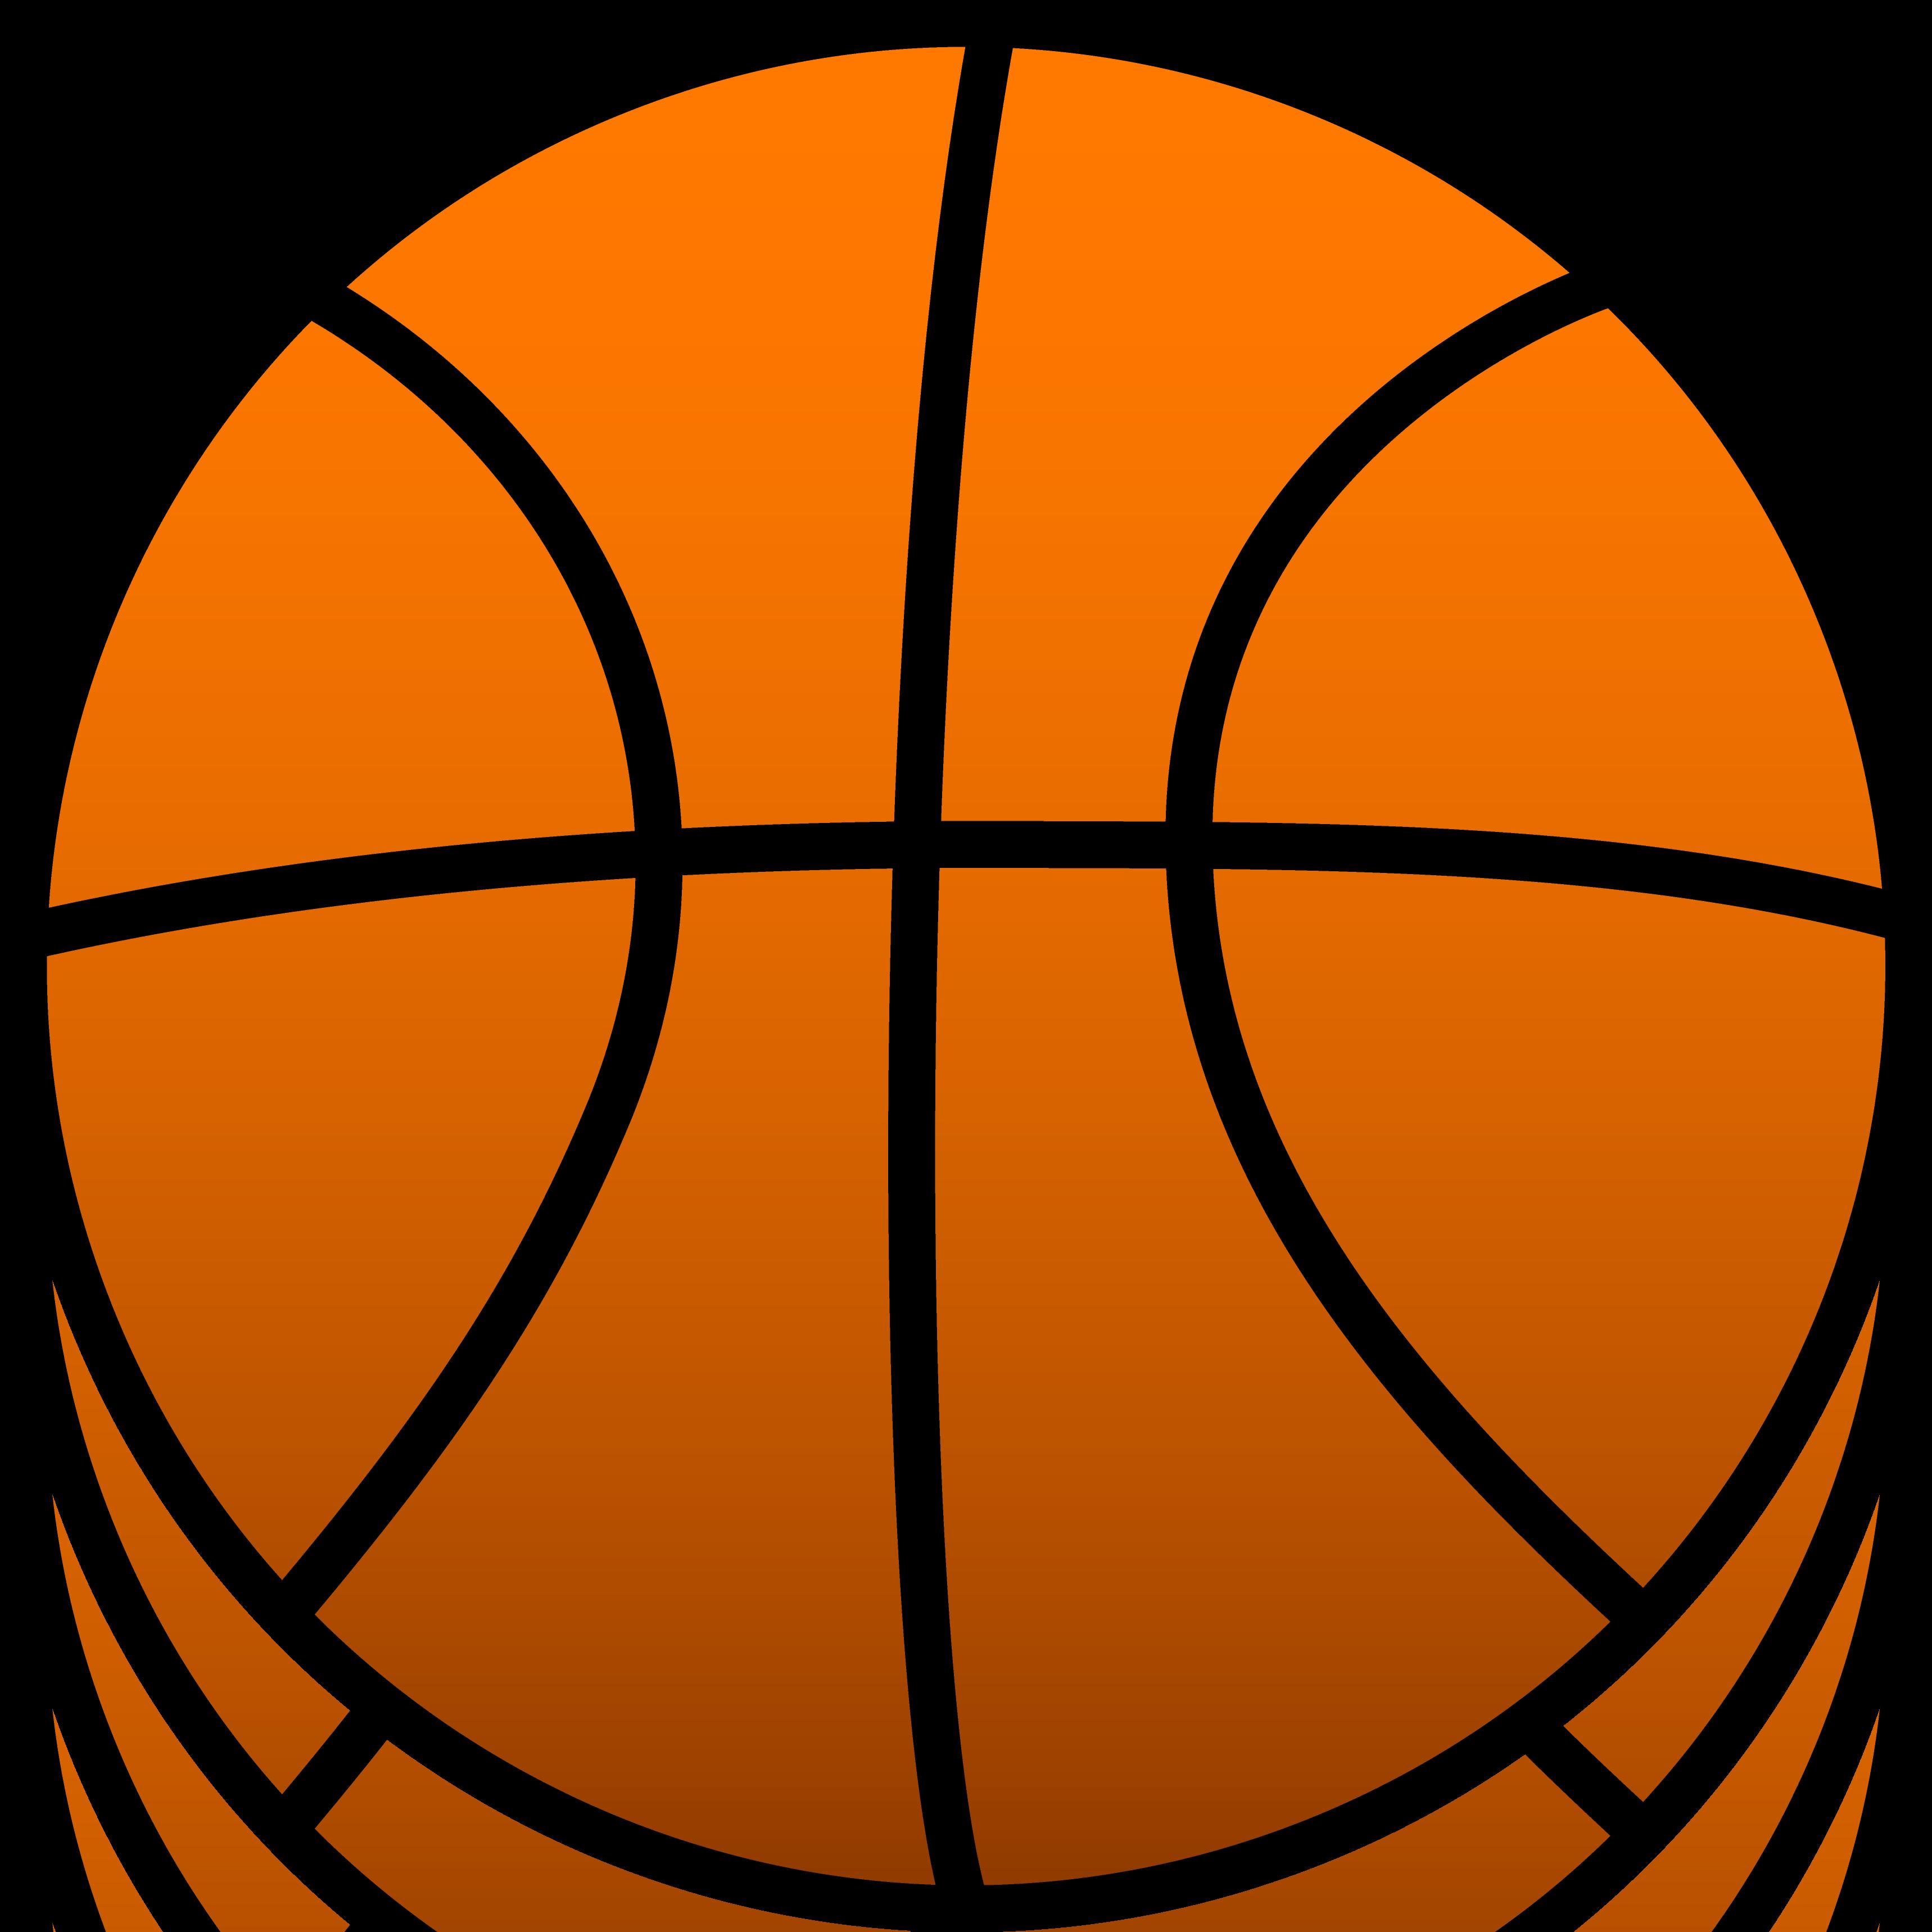 3437x3437 Top 69 Basketball Clip Art